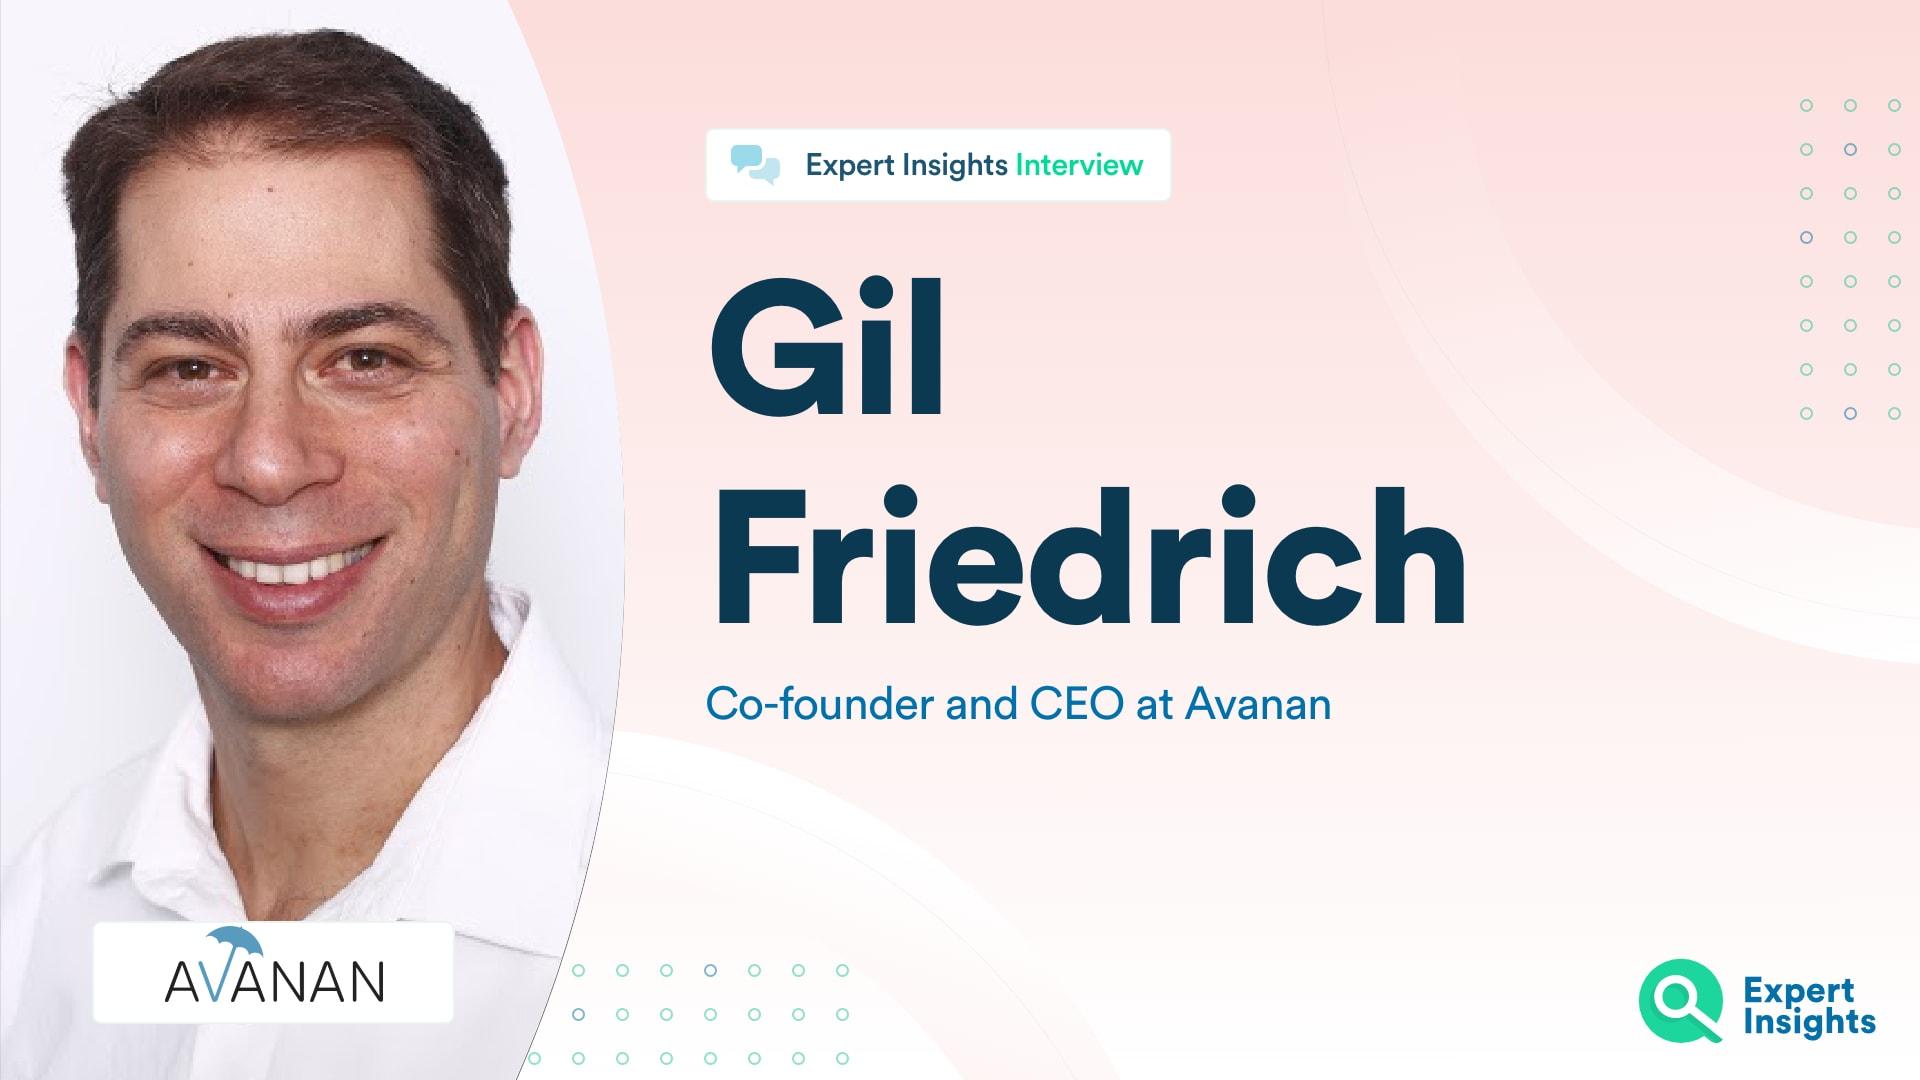 Gil Friedrich Avanan Interview